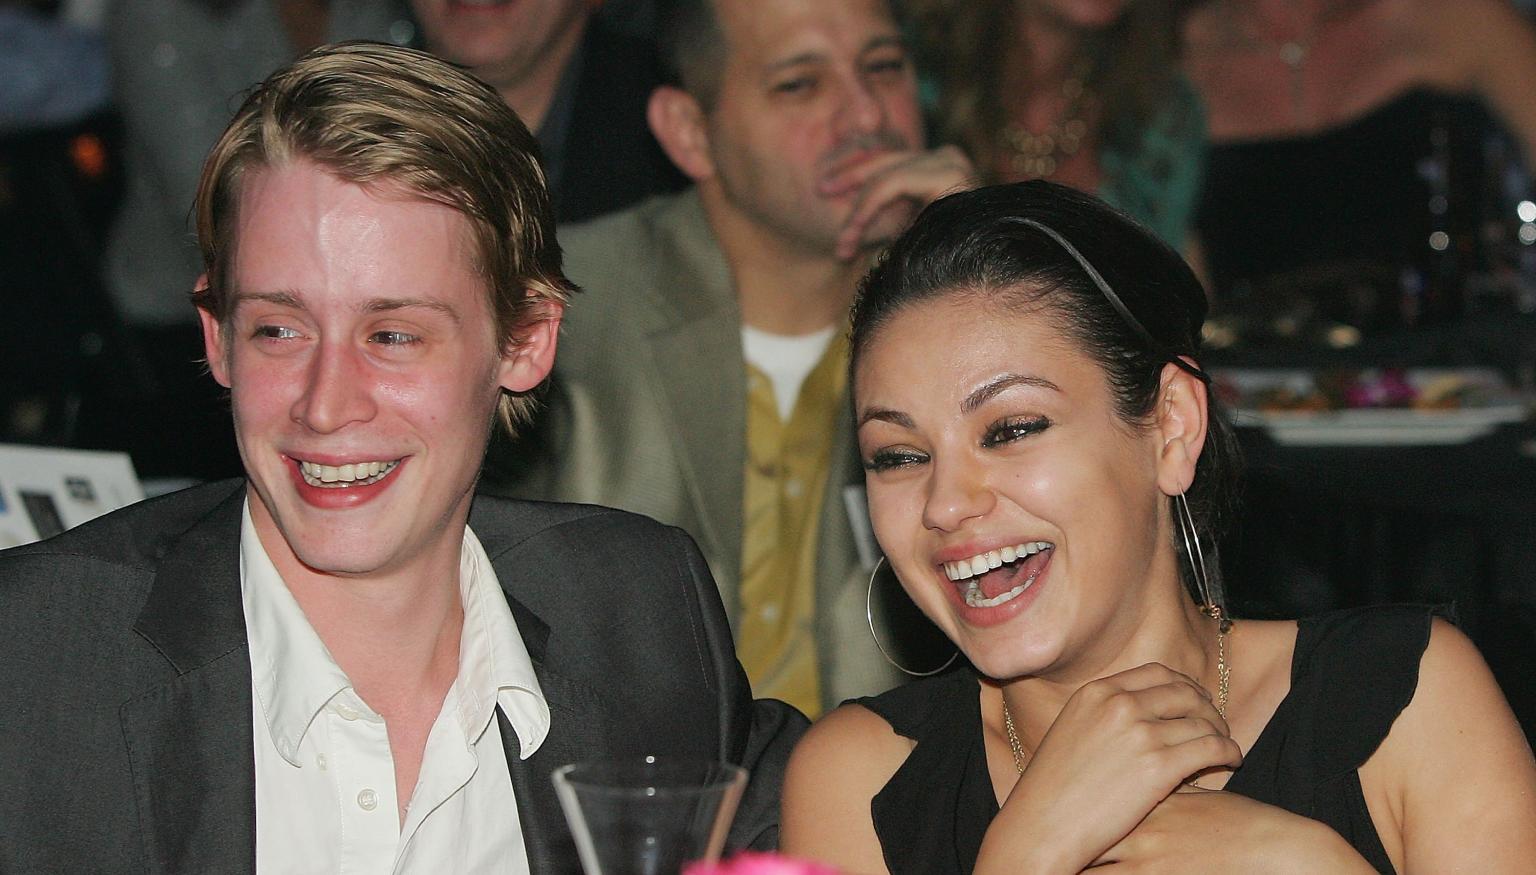 Mila kunis dating macaulay